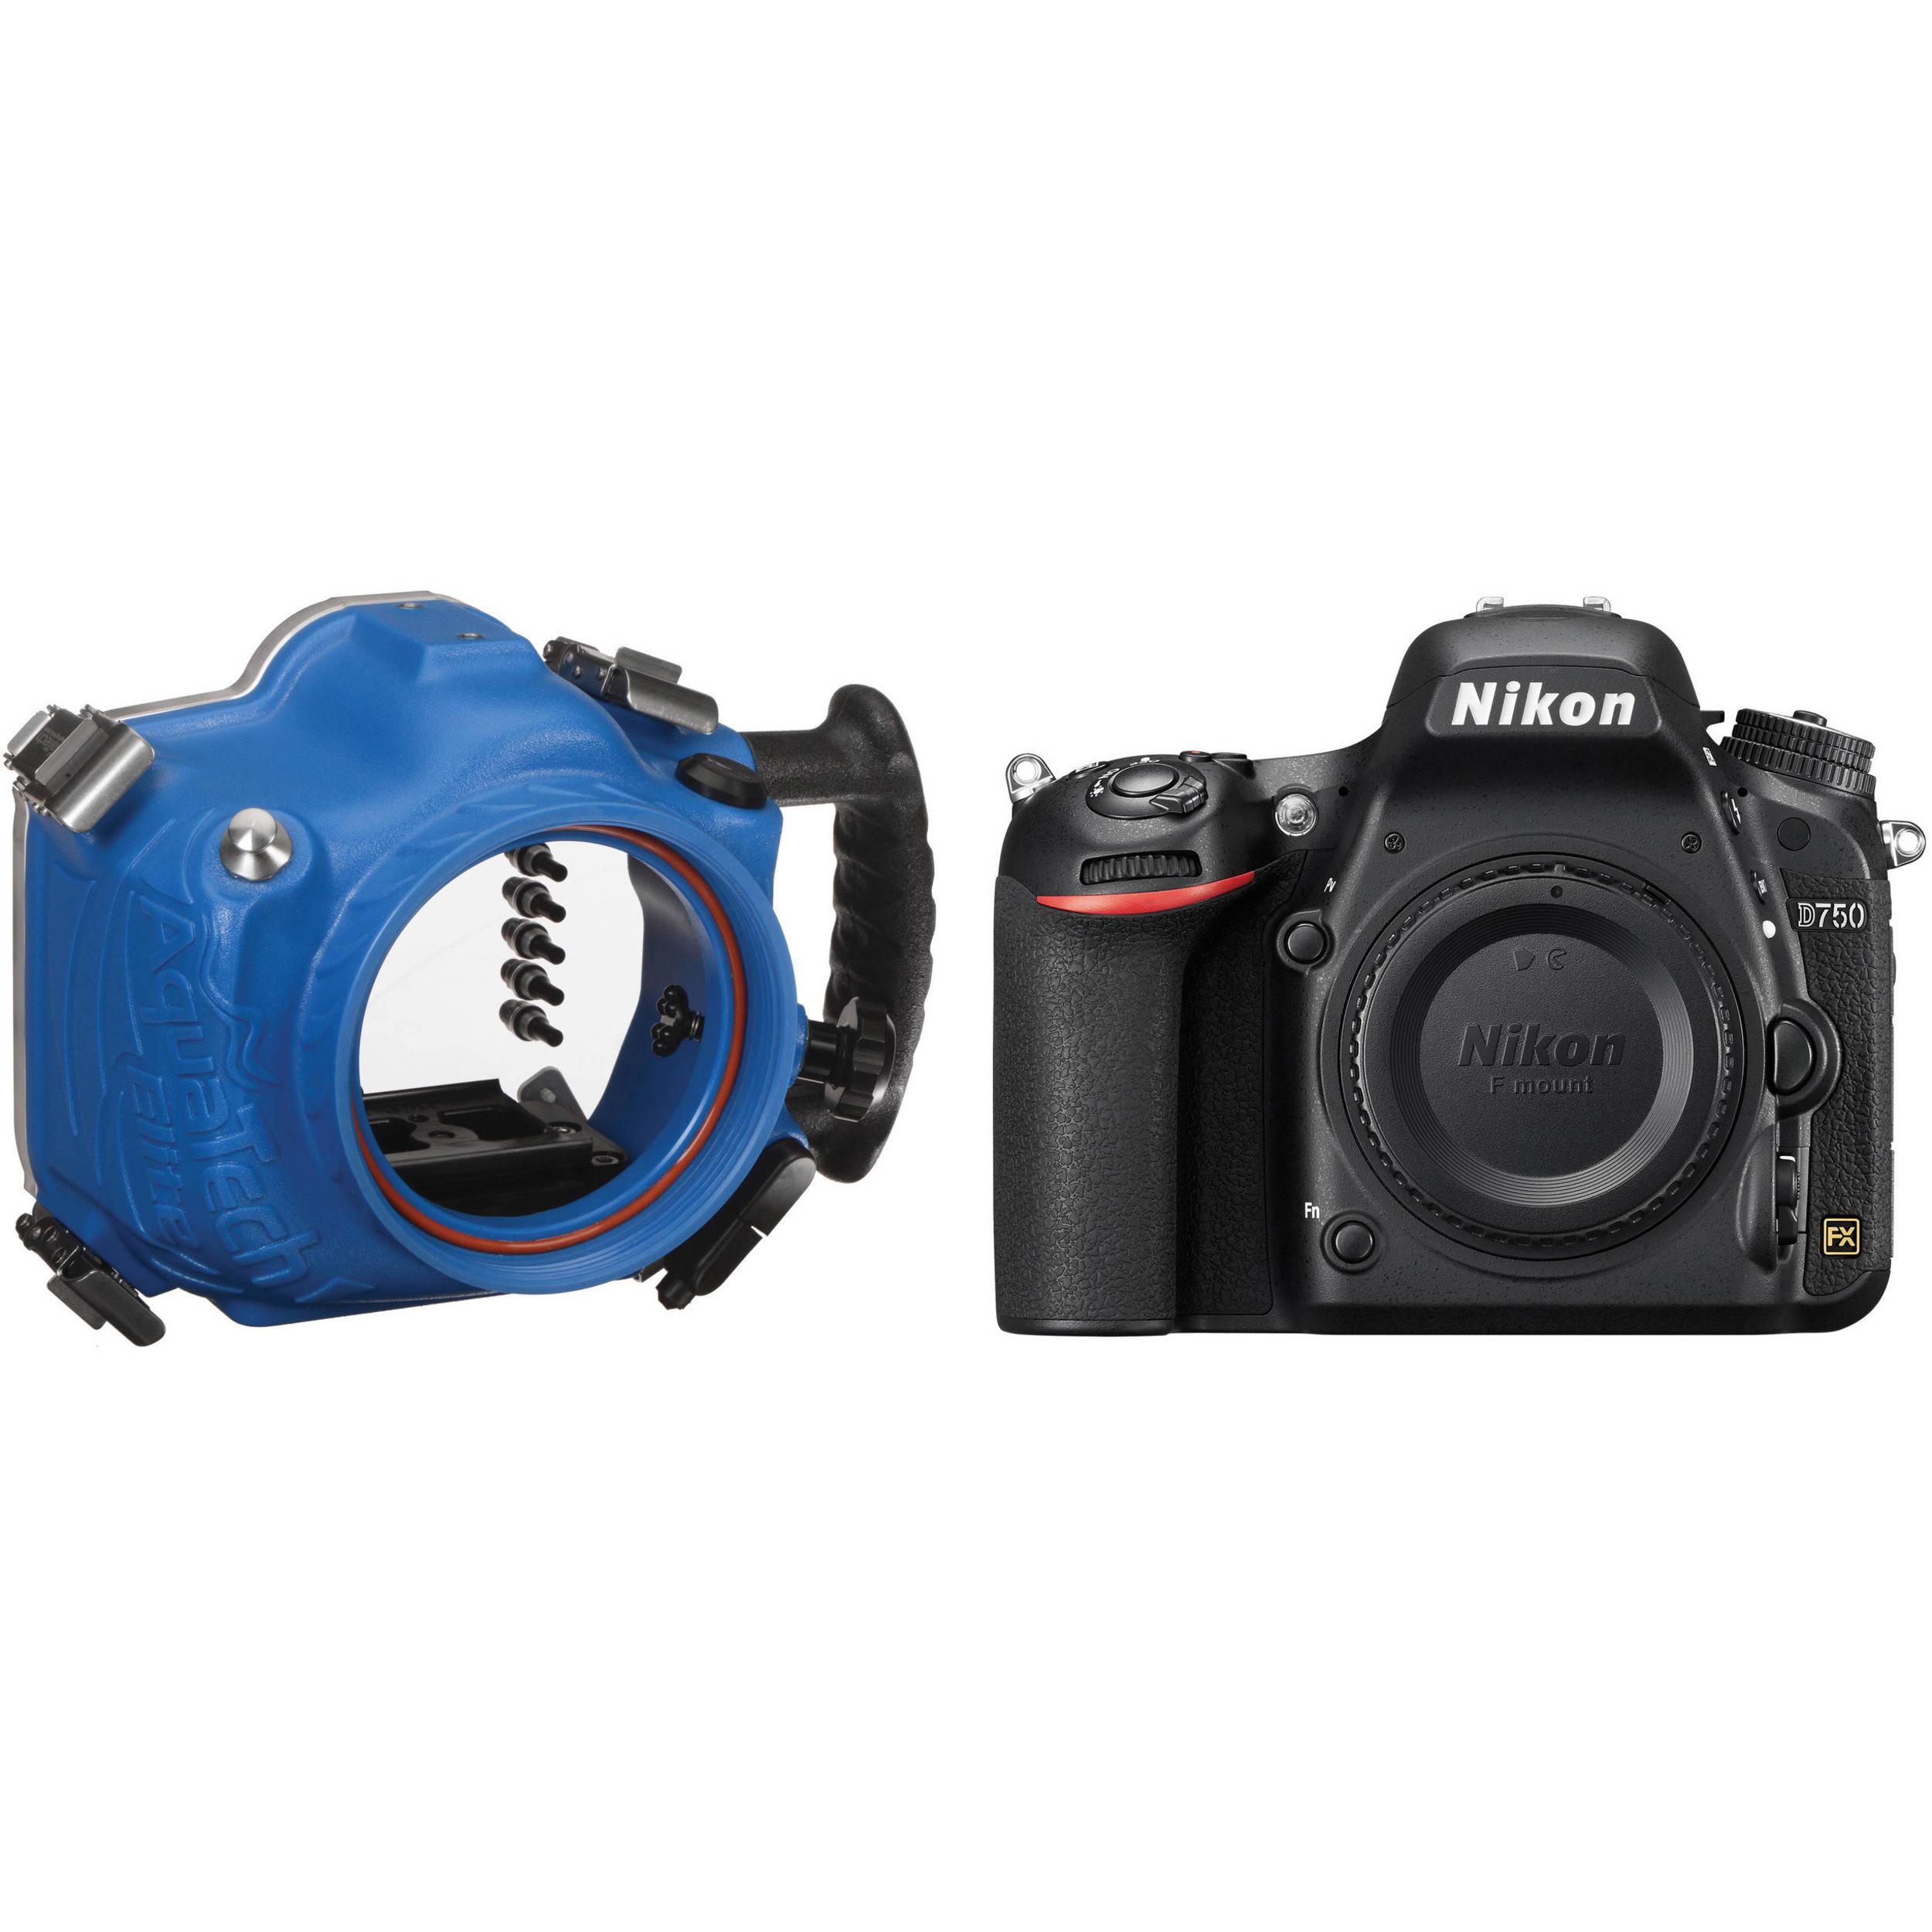 Nikon D750 Timelapse